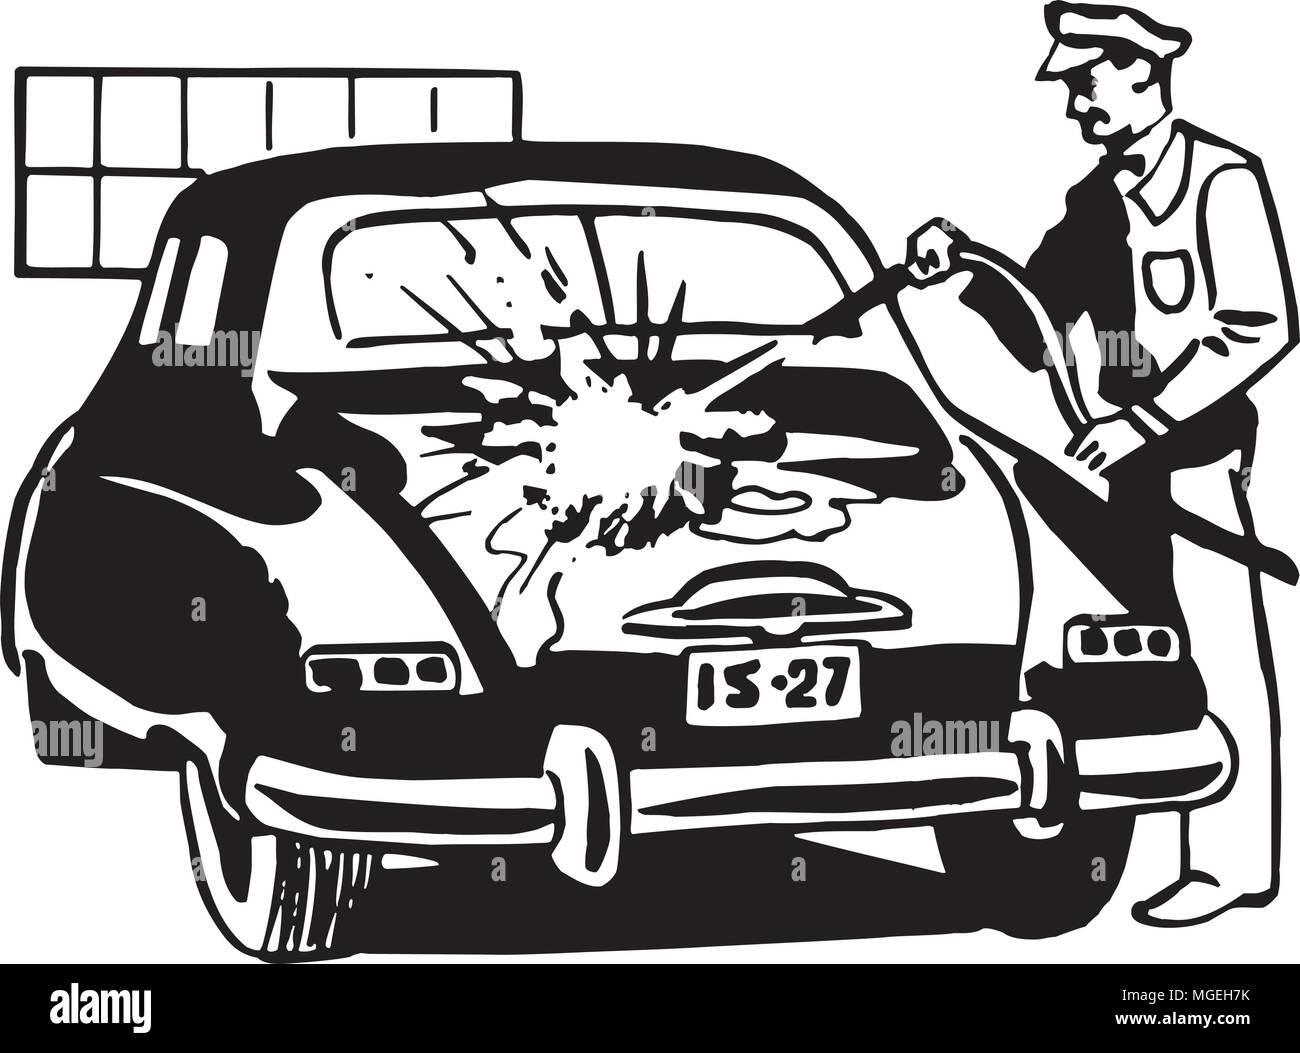 Serviceman Washing Car - Retro Clipart Illustration - Stock Vector